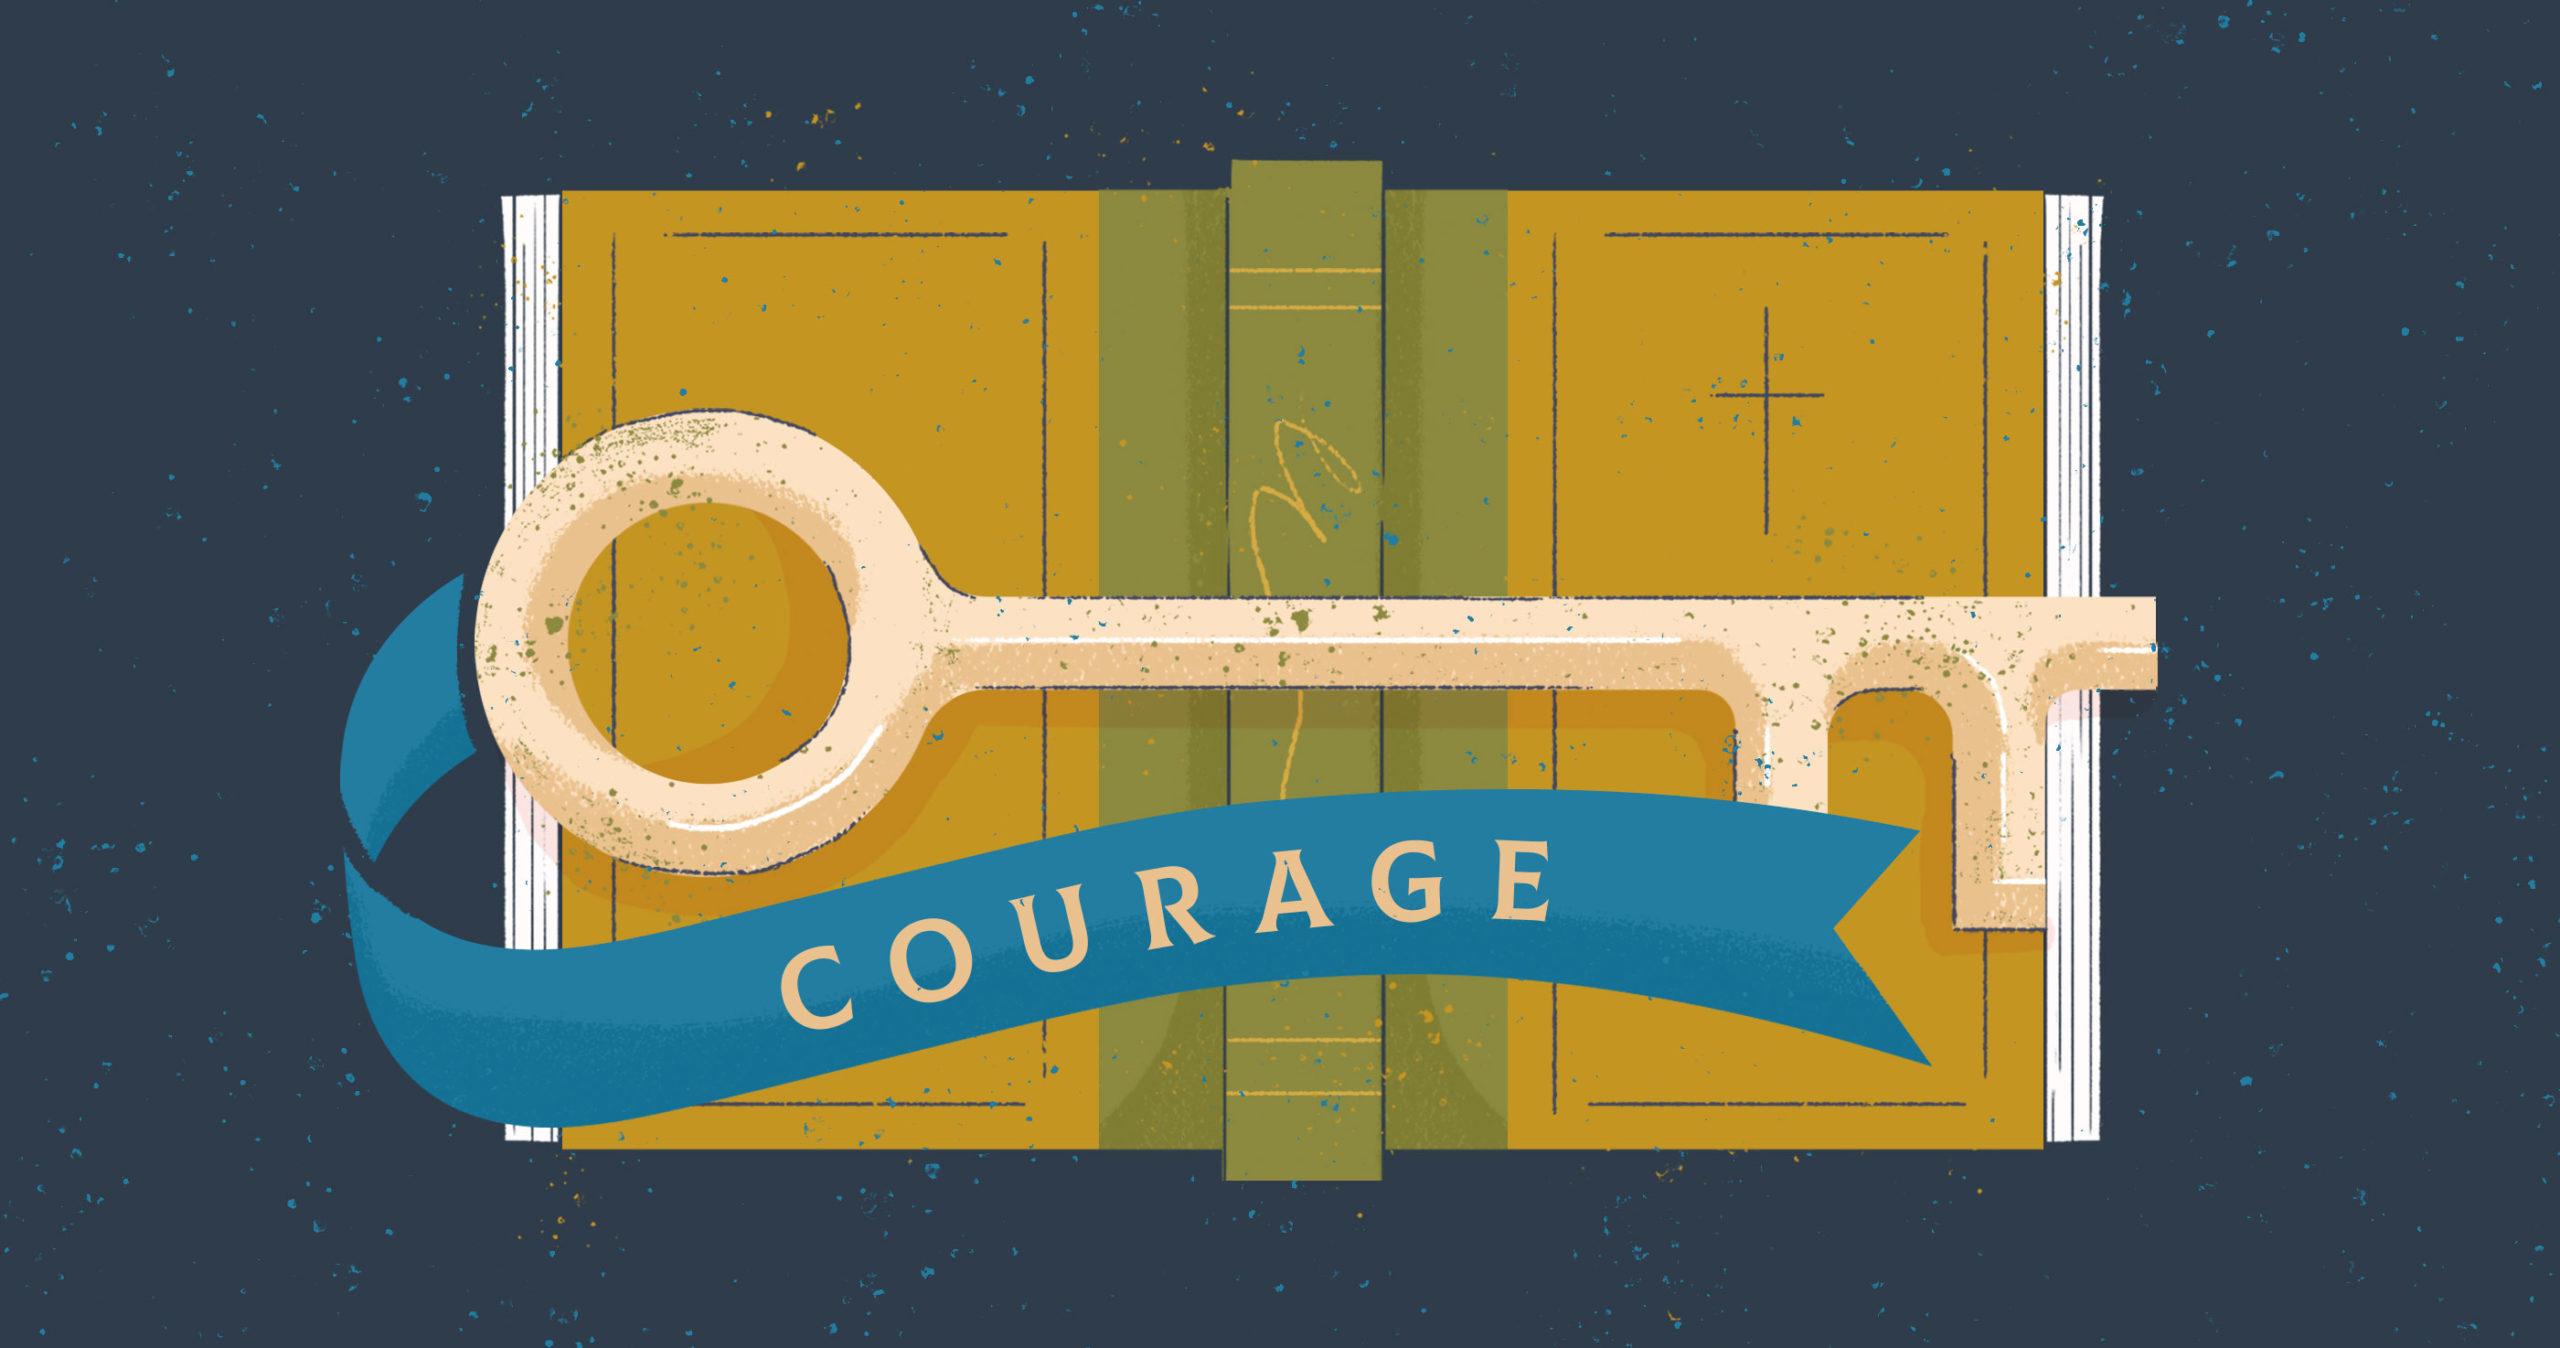 Vargje kyce biblike mbi guximin (guximi)